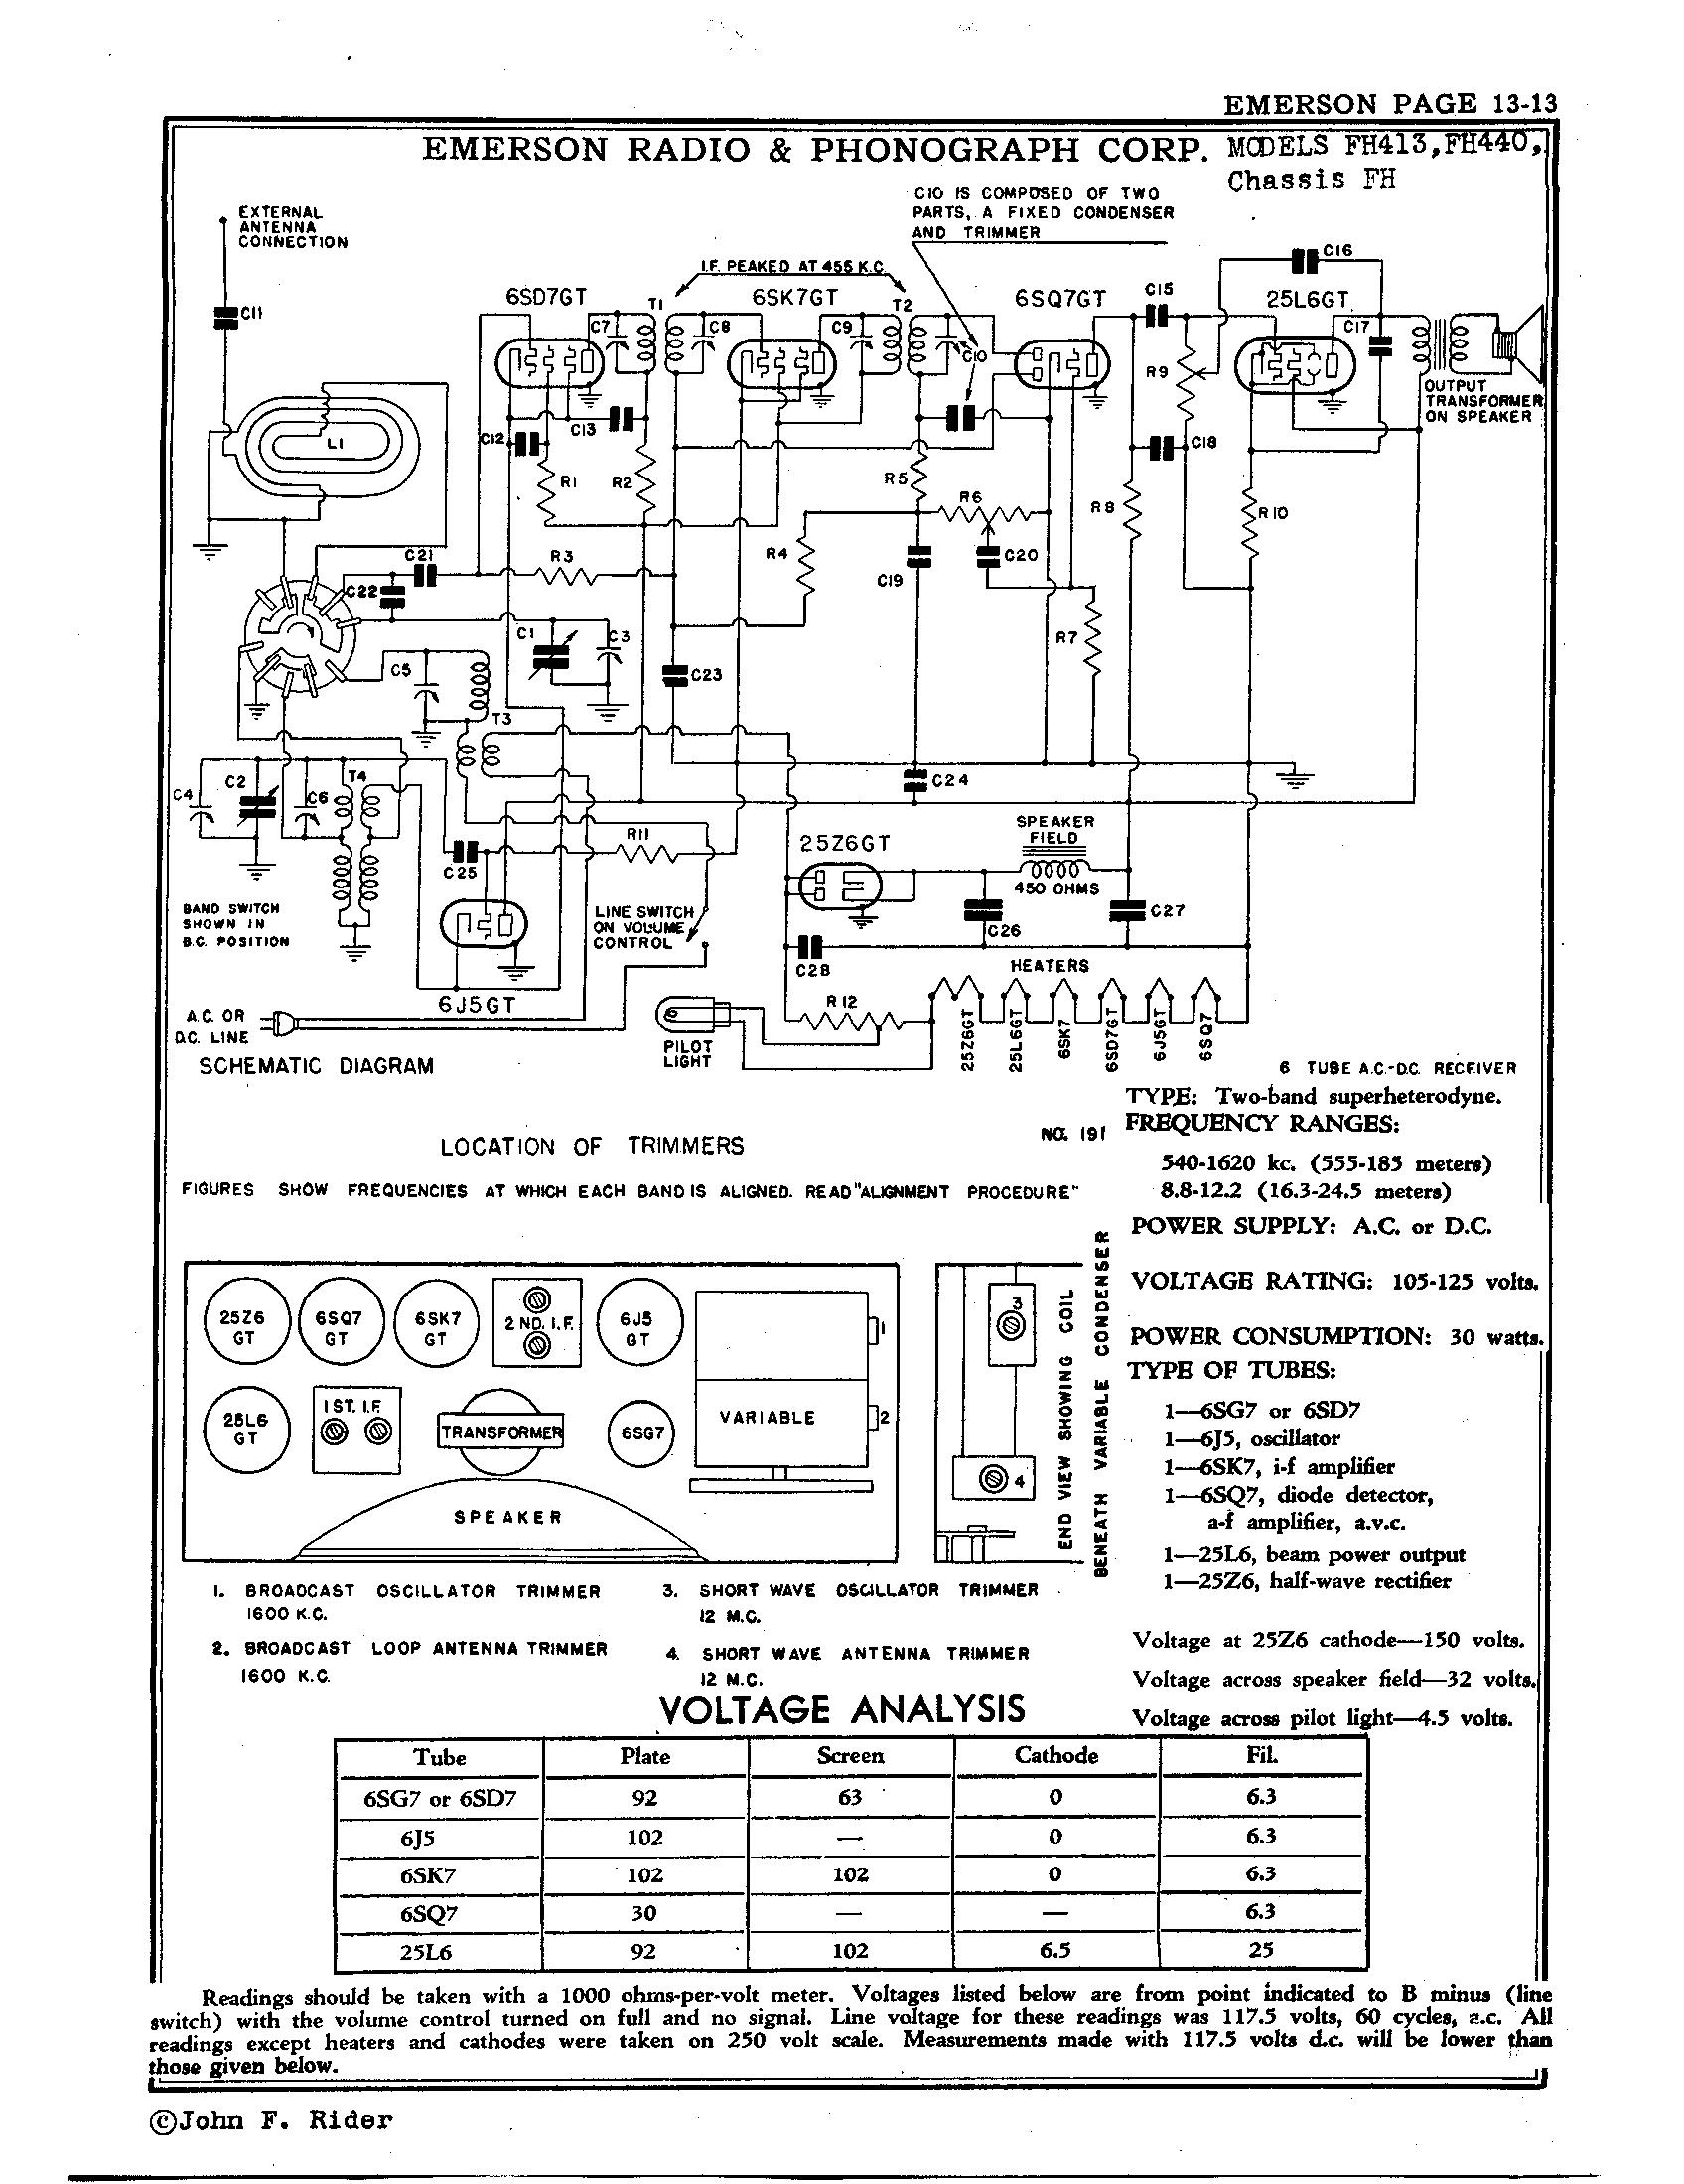 emerson radio phonograph corp fh440 antique electronic supply rh tubesandmore com emerson schematics Radio Shack Schematics